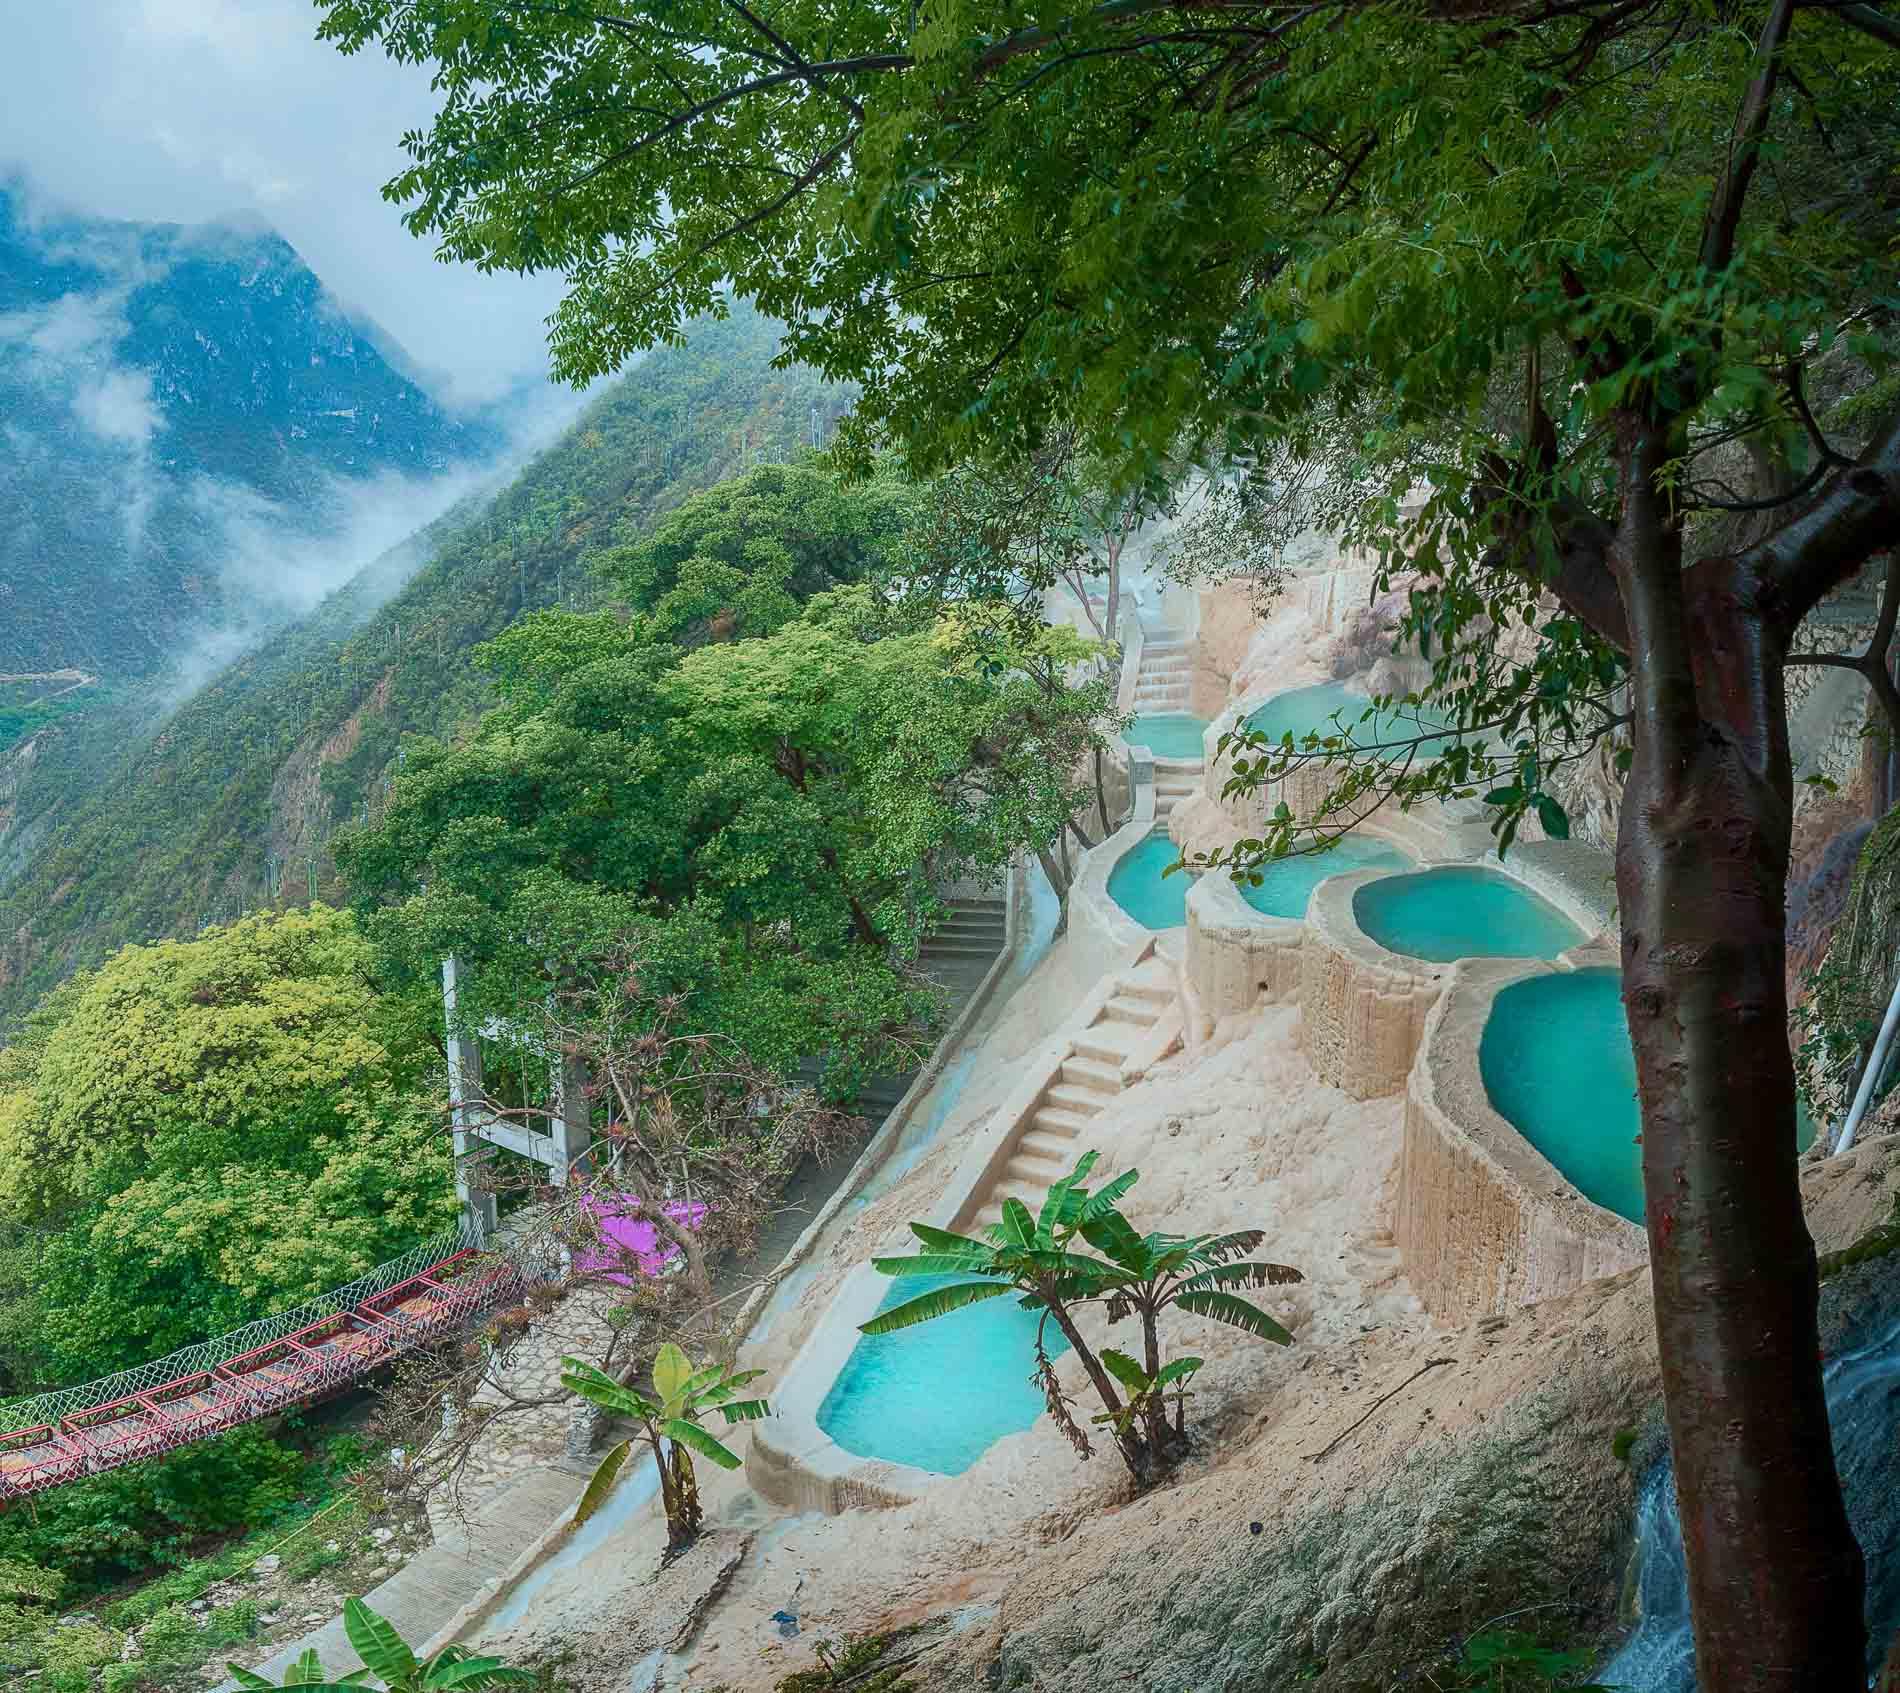 El Parayso, Tolantongo - Messico - piscine termali naturali